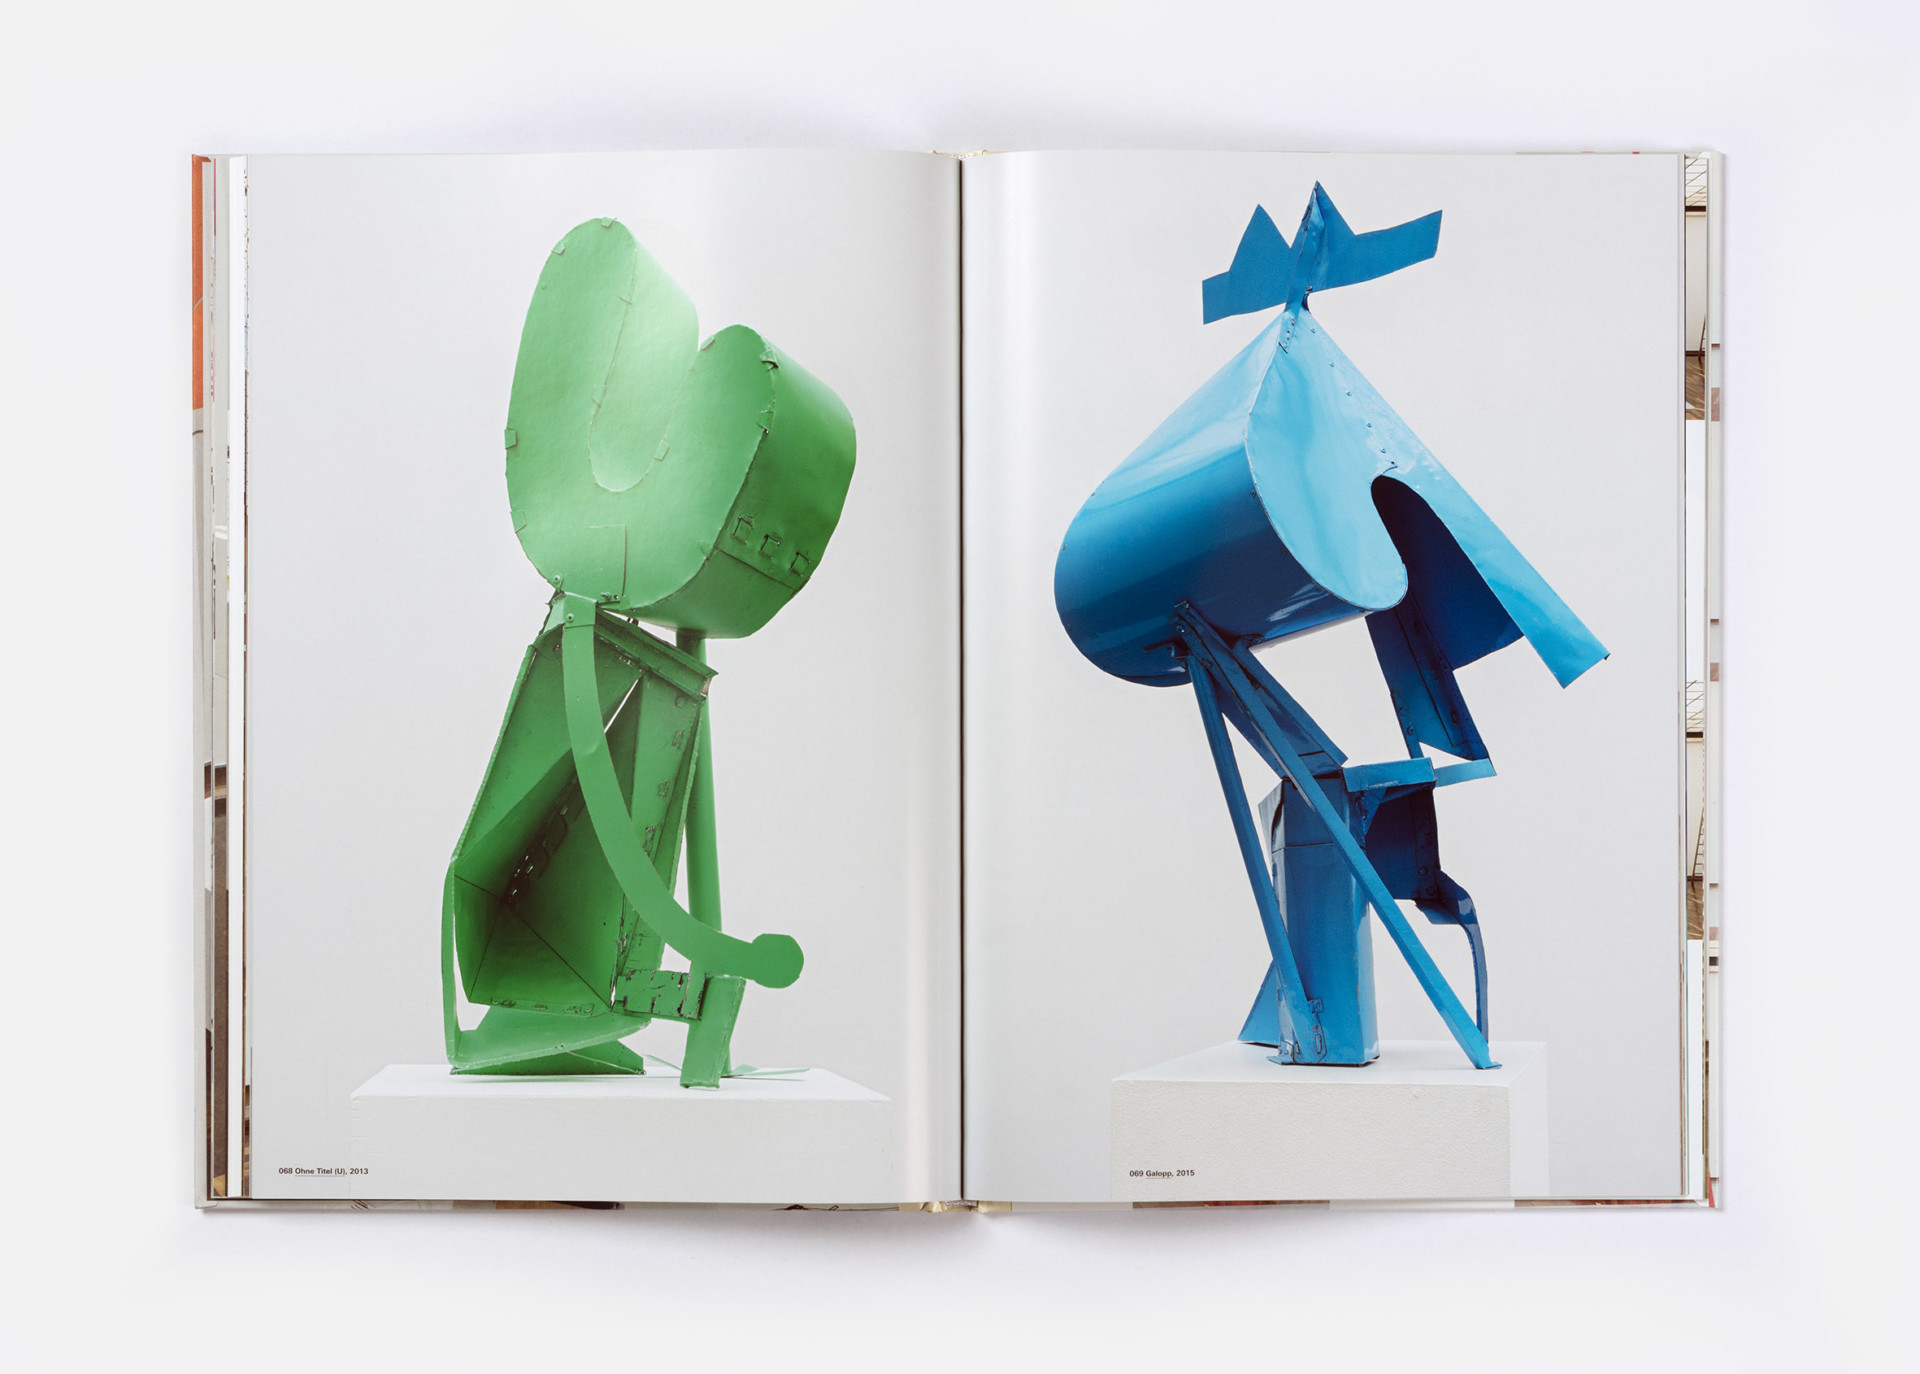 PHILIPP OTTENDÖRFER FOTOGRAFIE Thomas Kiesewetter Bildhauer